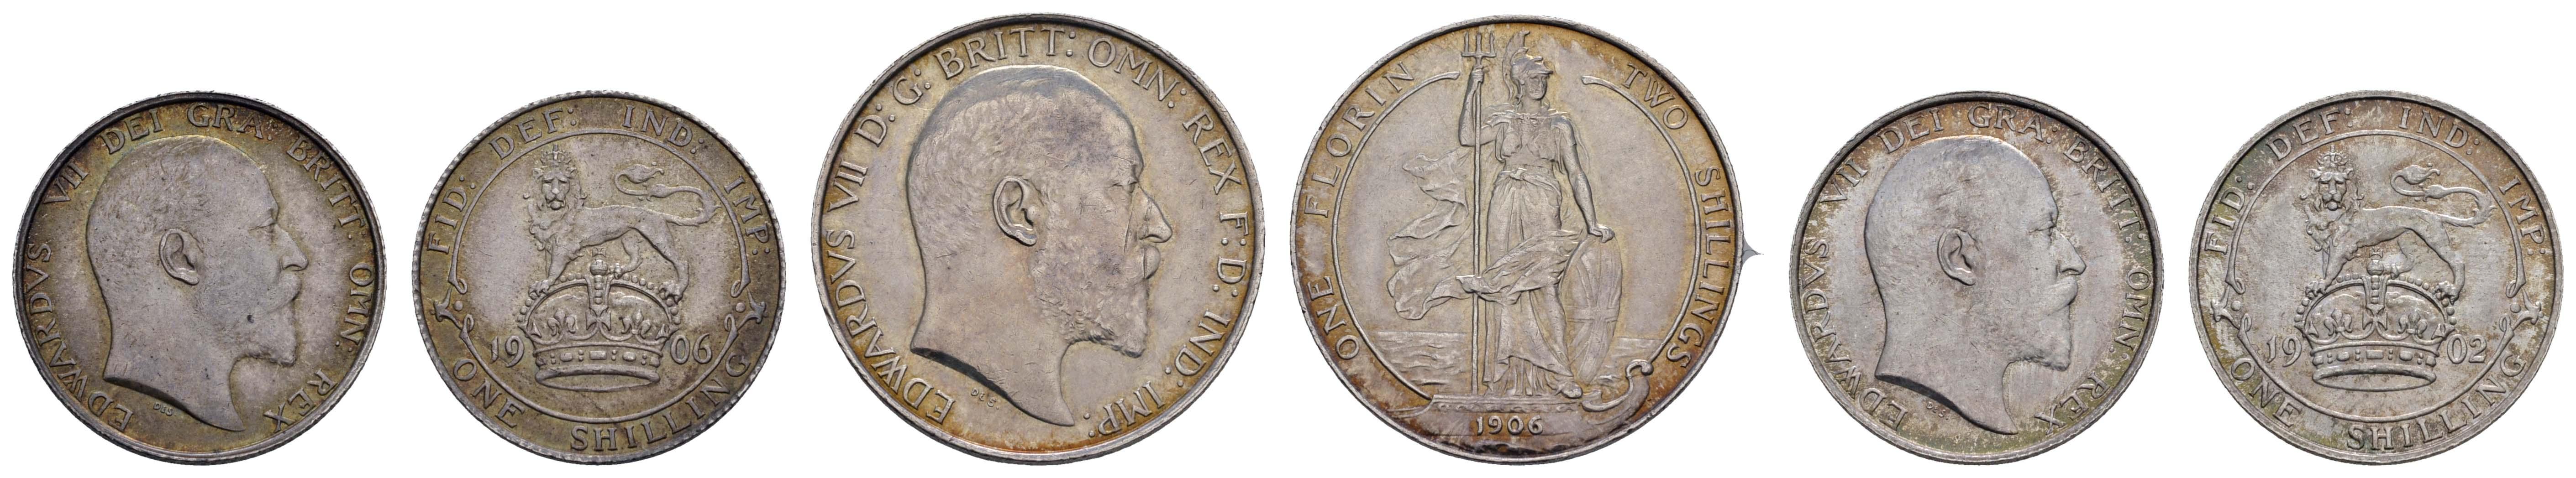 Lot 1595 - europa ab 1800 - Großbritannien -  Auktionshaus Ulrich Felzmann GmbH & Co. KG Coins single lots